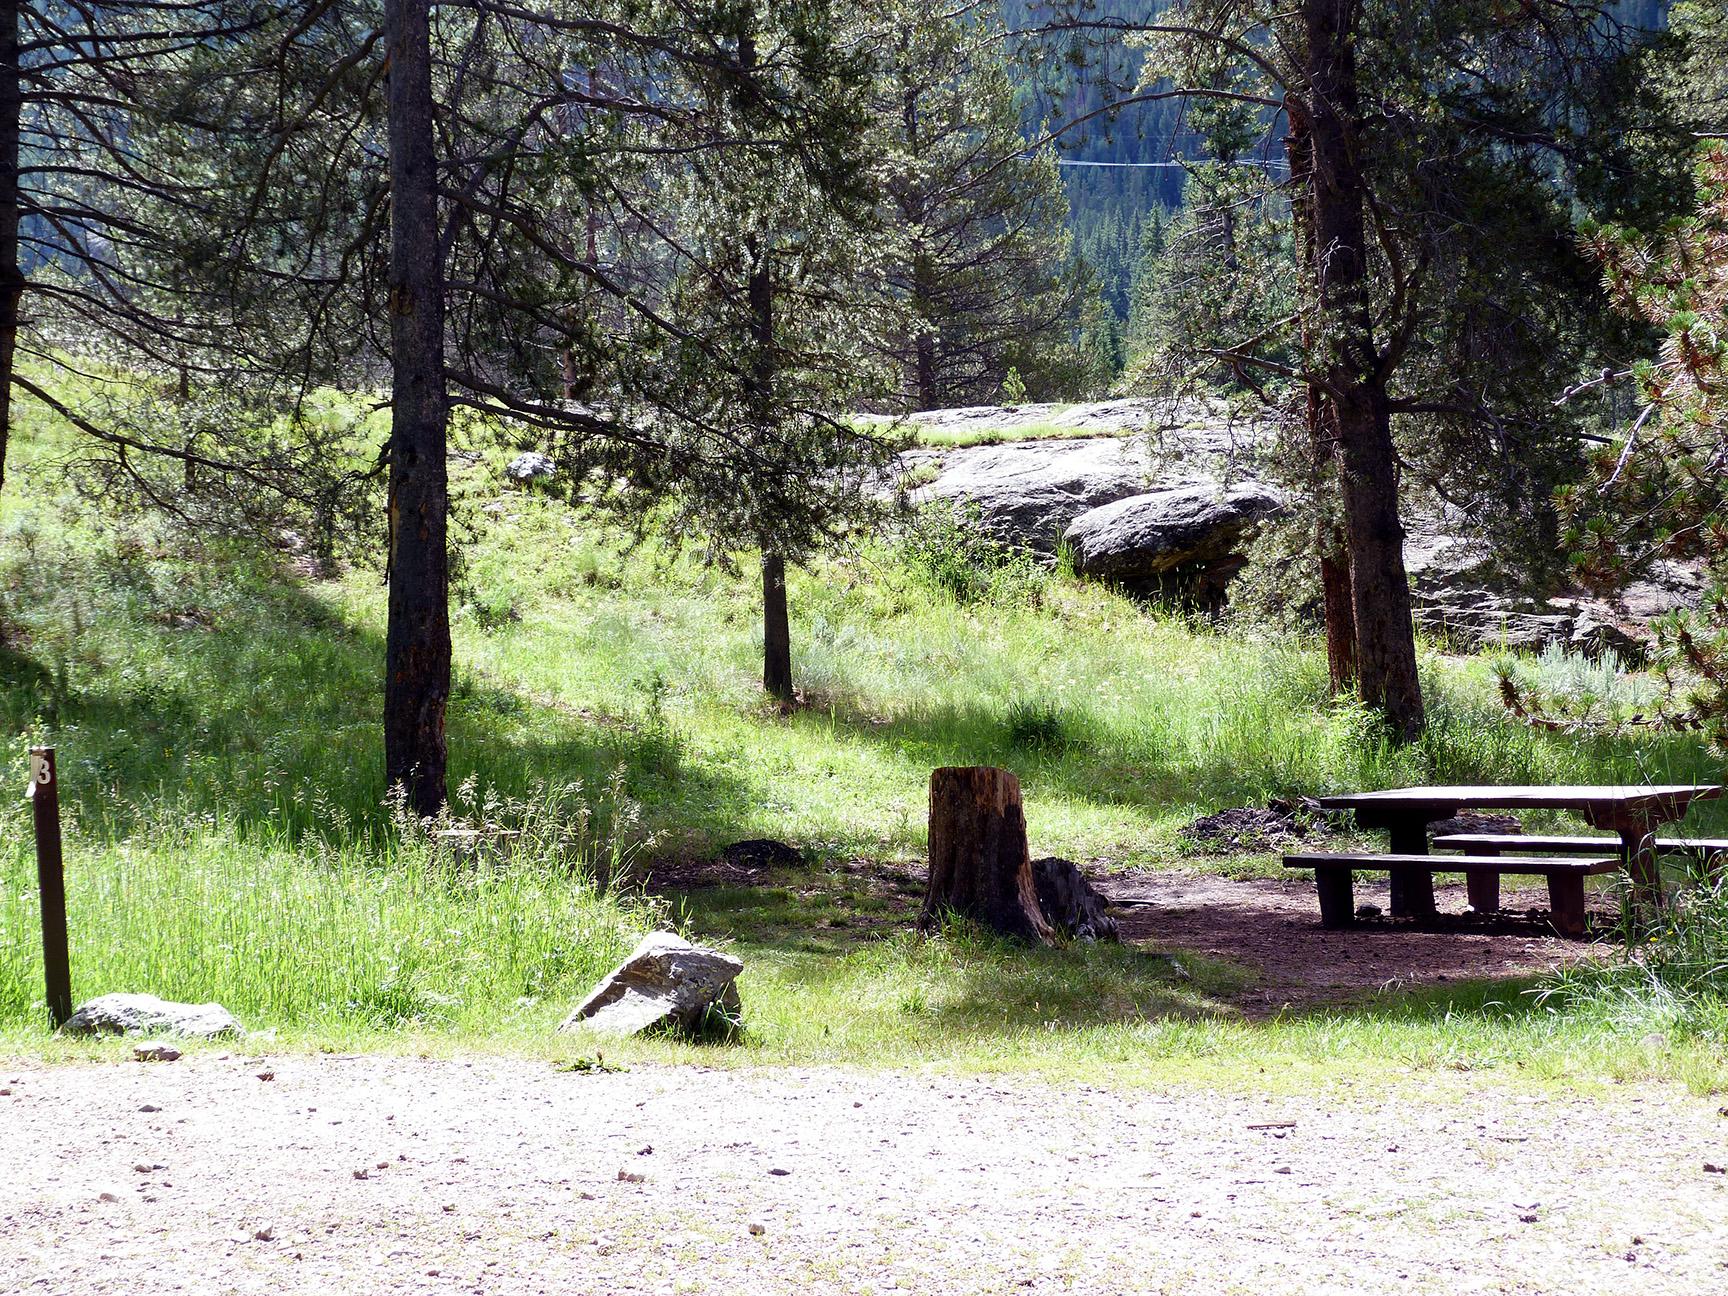 Camp-out-colorado-elk-wallow-campsite-3